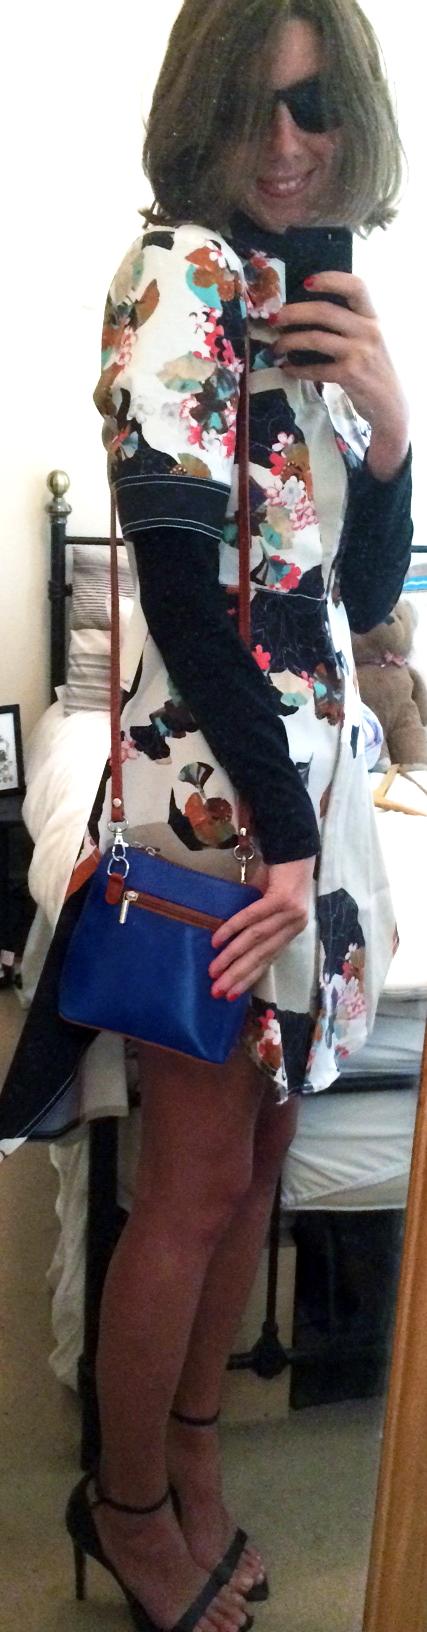 Phillip Lim for Target dress, ZARA Heels, $2Black Turtleneck, Blue   Crossbody Bag ,  Black Sunglasses